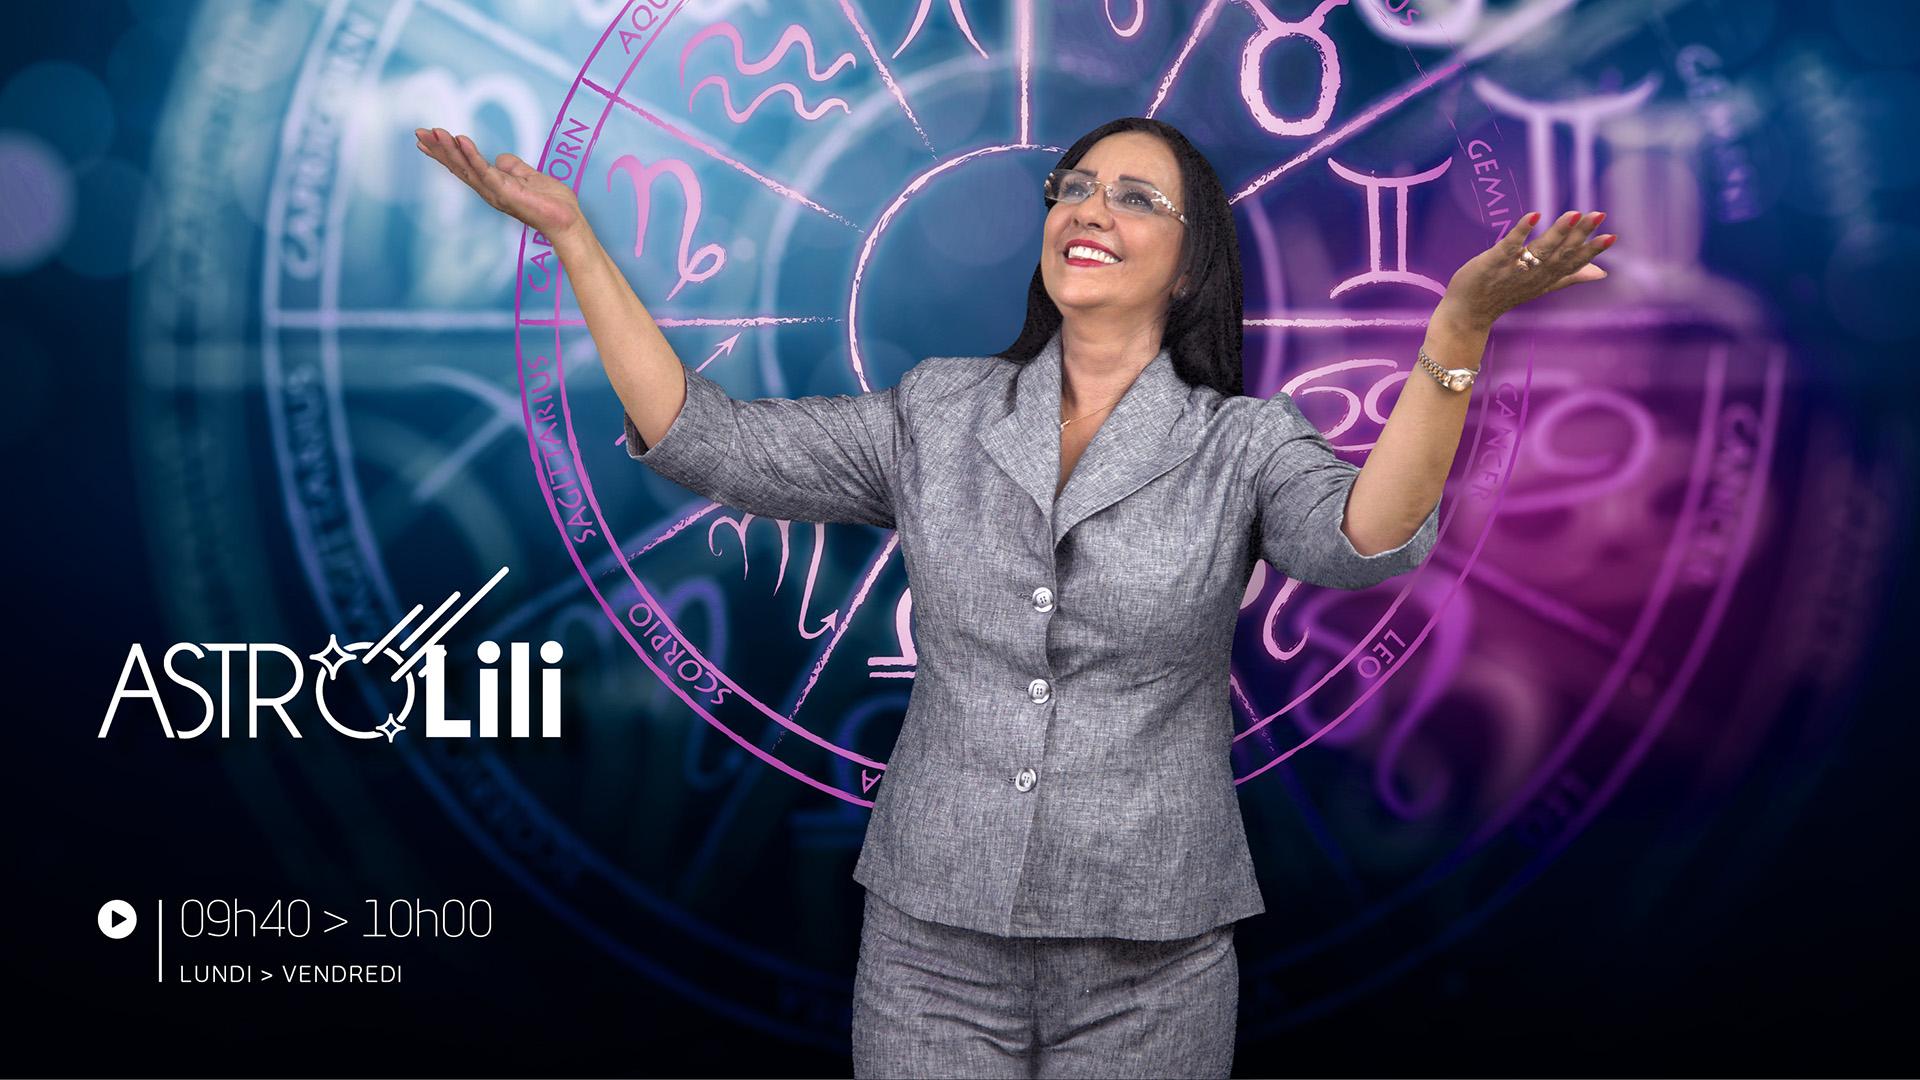 Astro Lili du Jeudi 28 Mai 2020